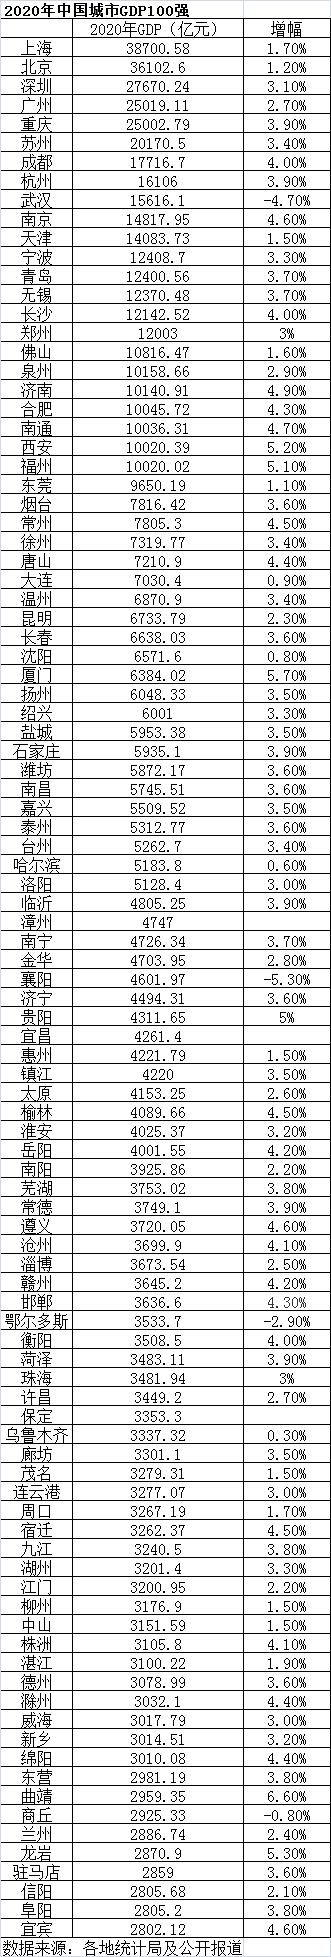 2020年中国城市GDP100强